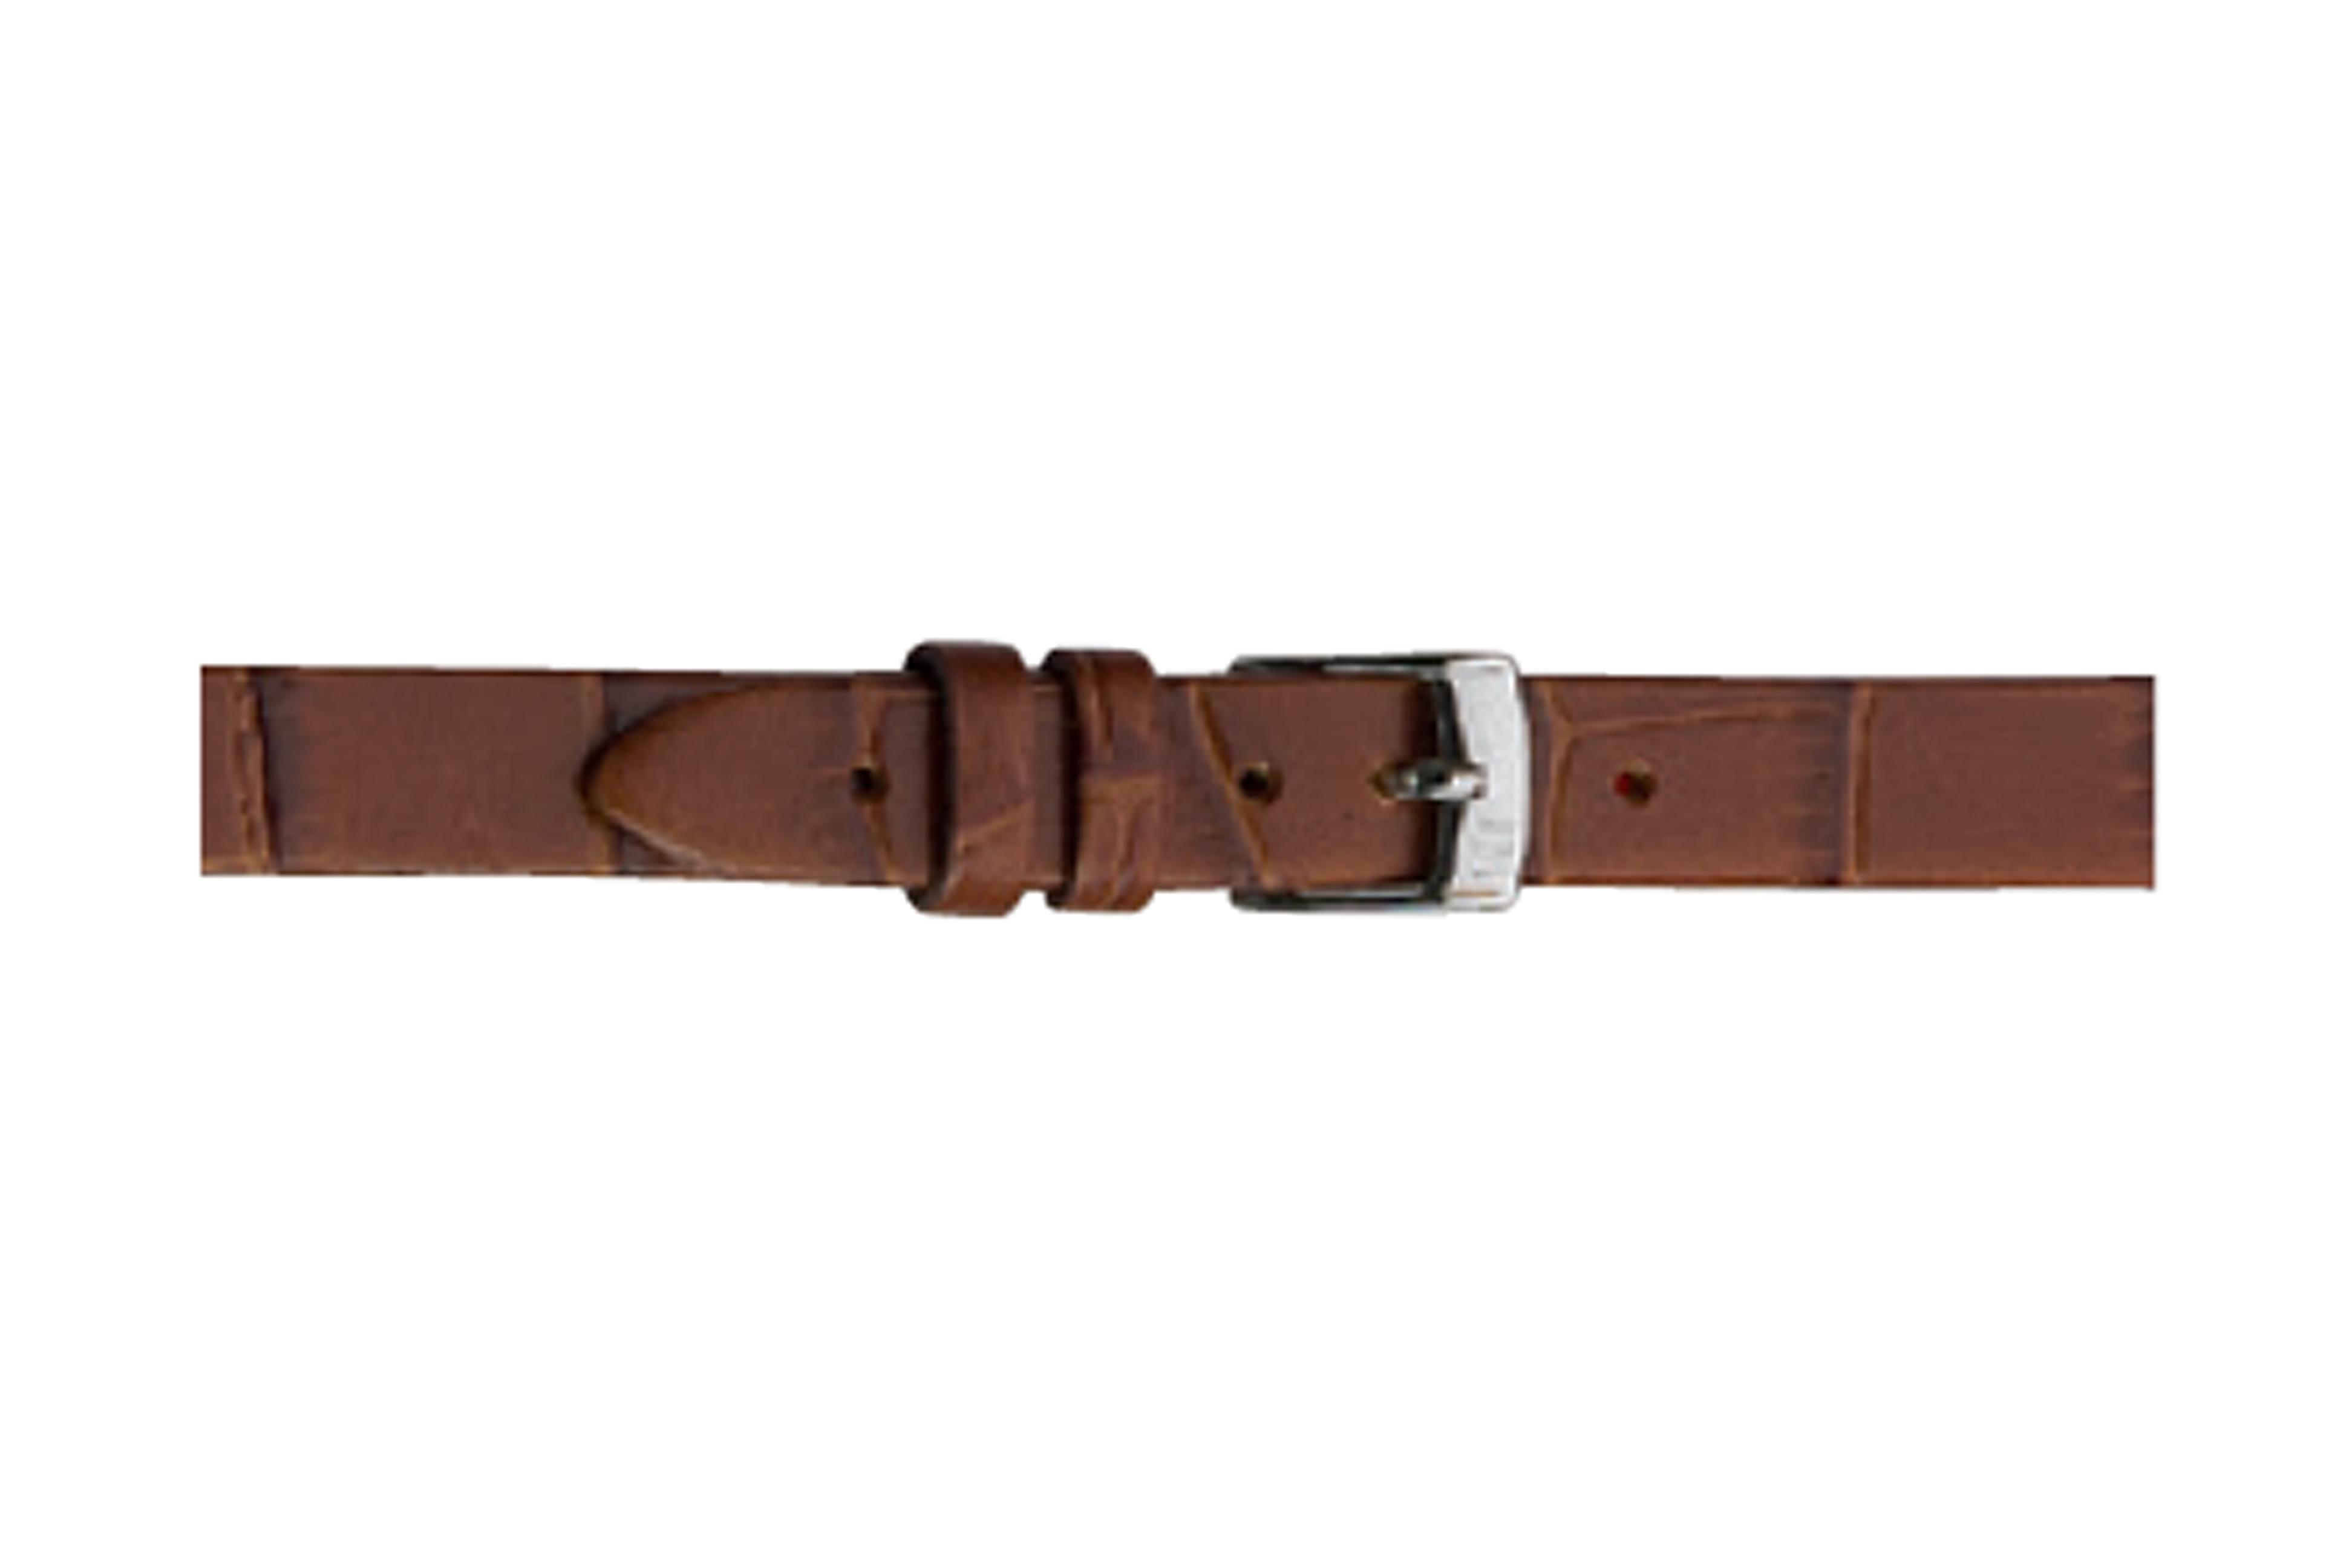 Morellato horlogeband Thin D2860656041CR06 / PMD041THINA06 Croco leder Bruin 6mm